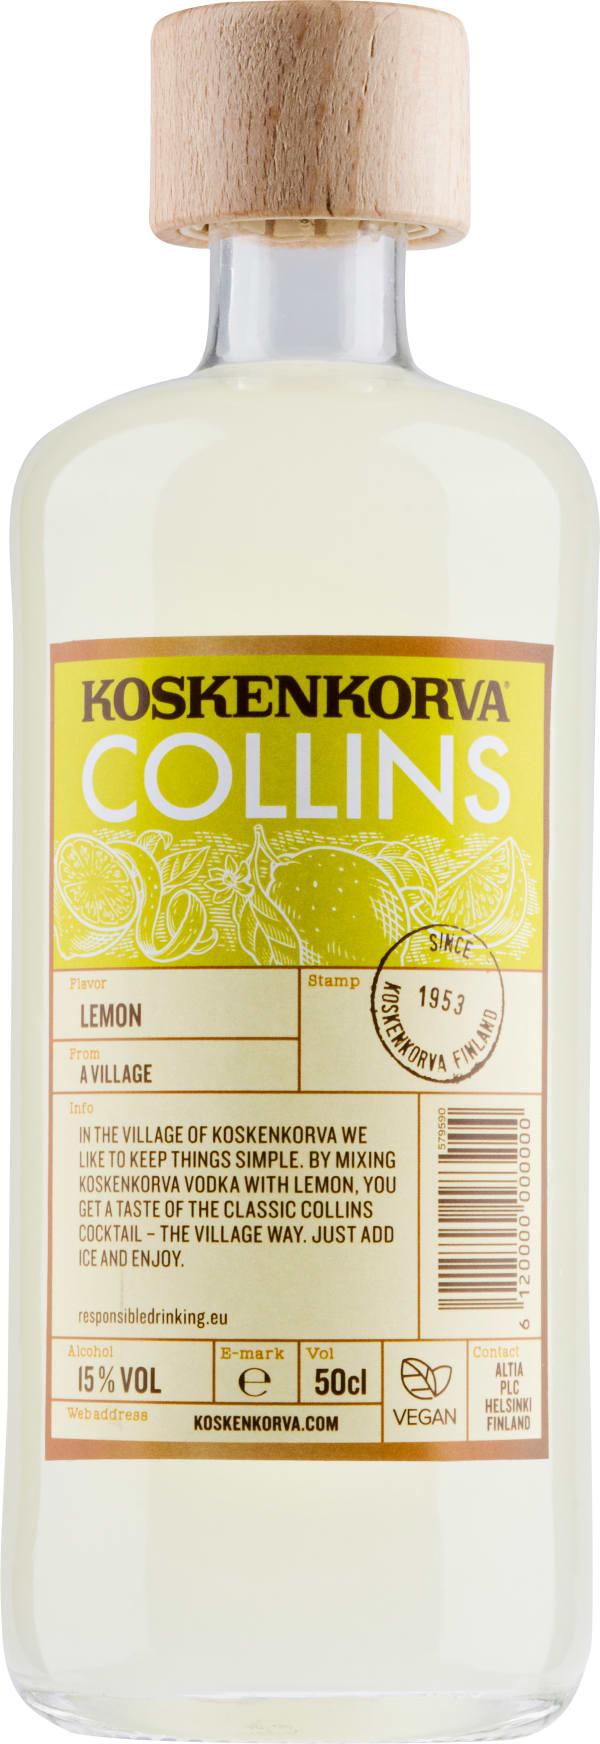 Koskenkorva Collins